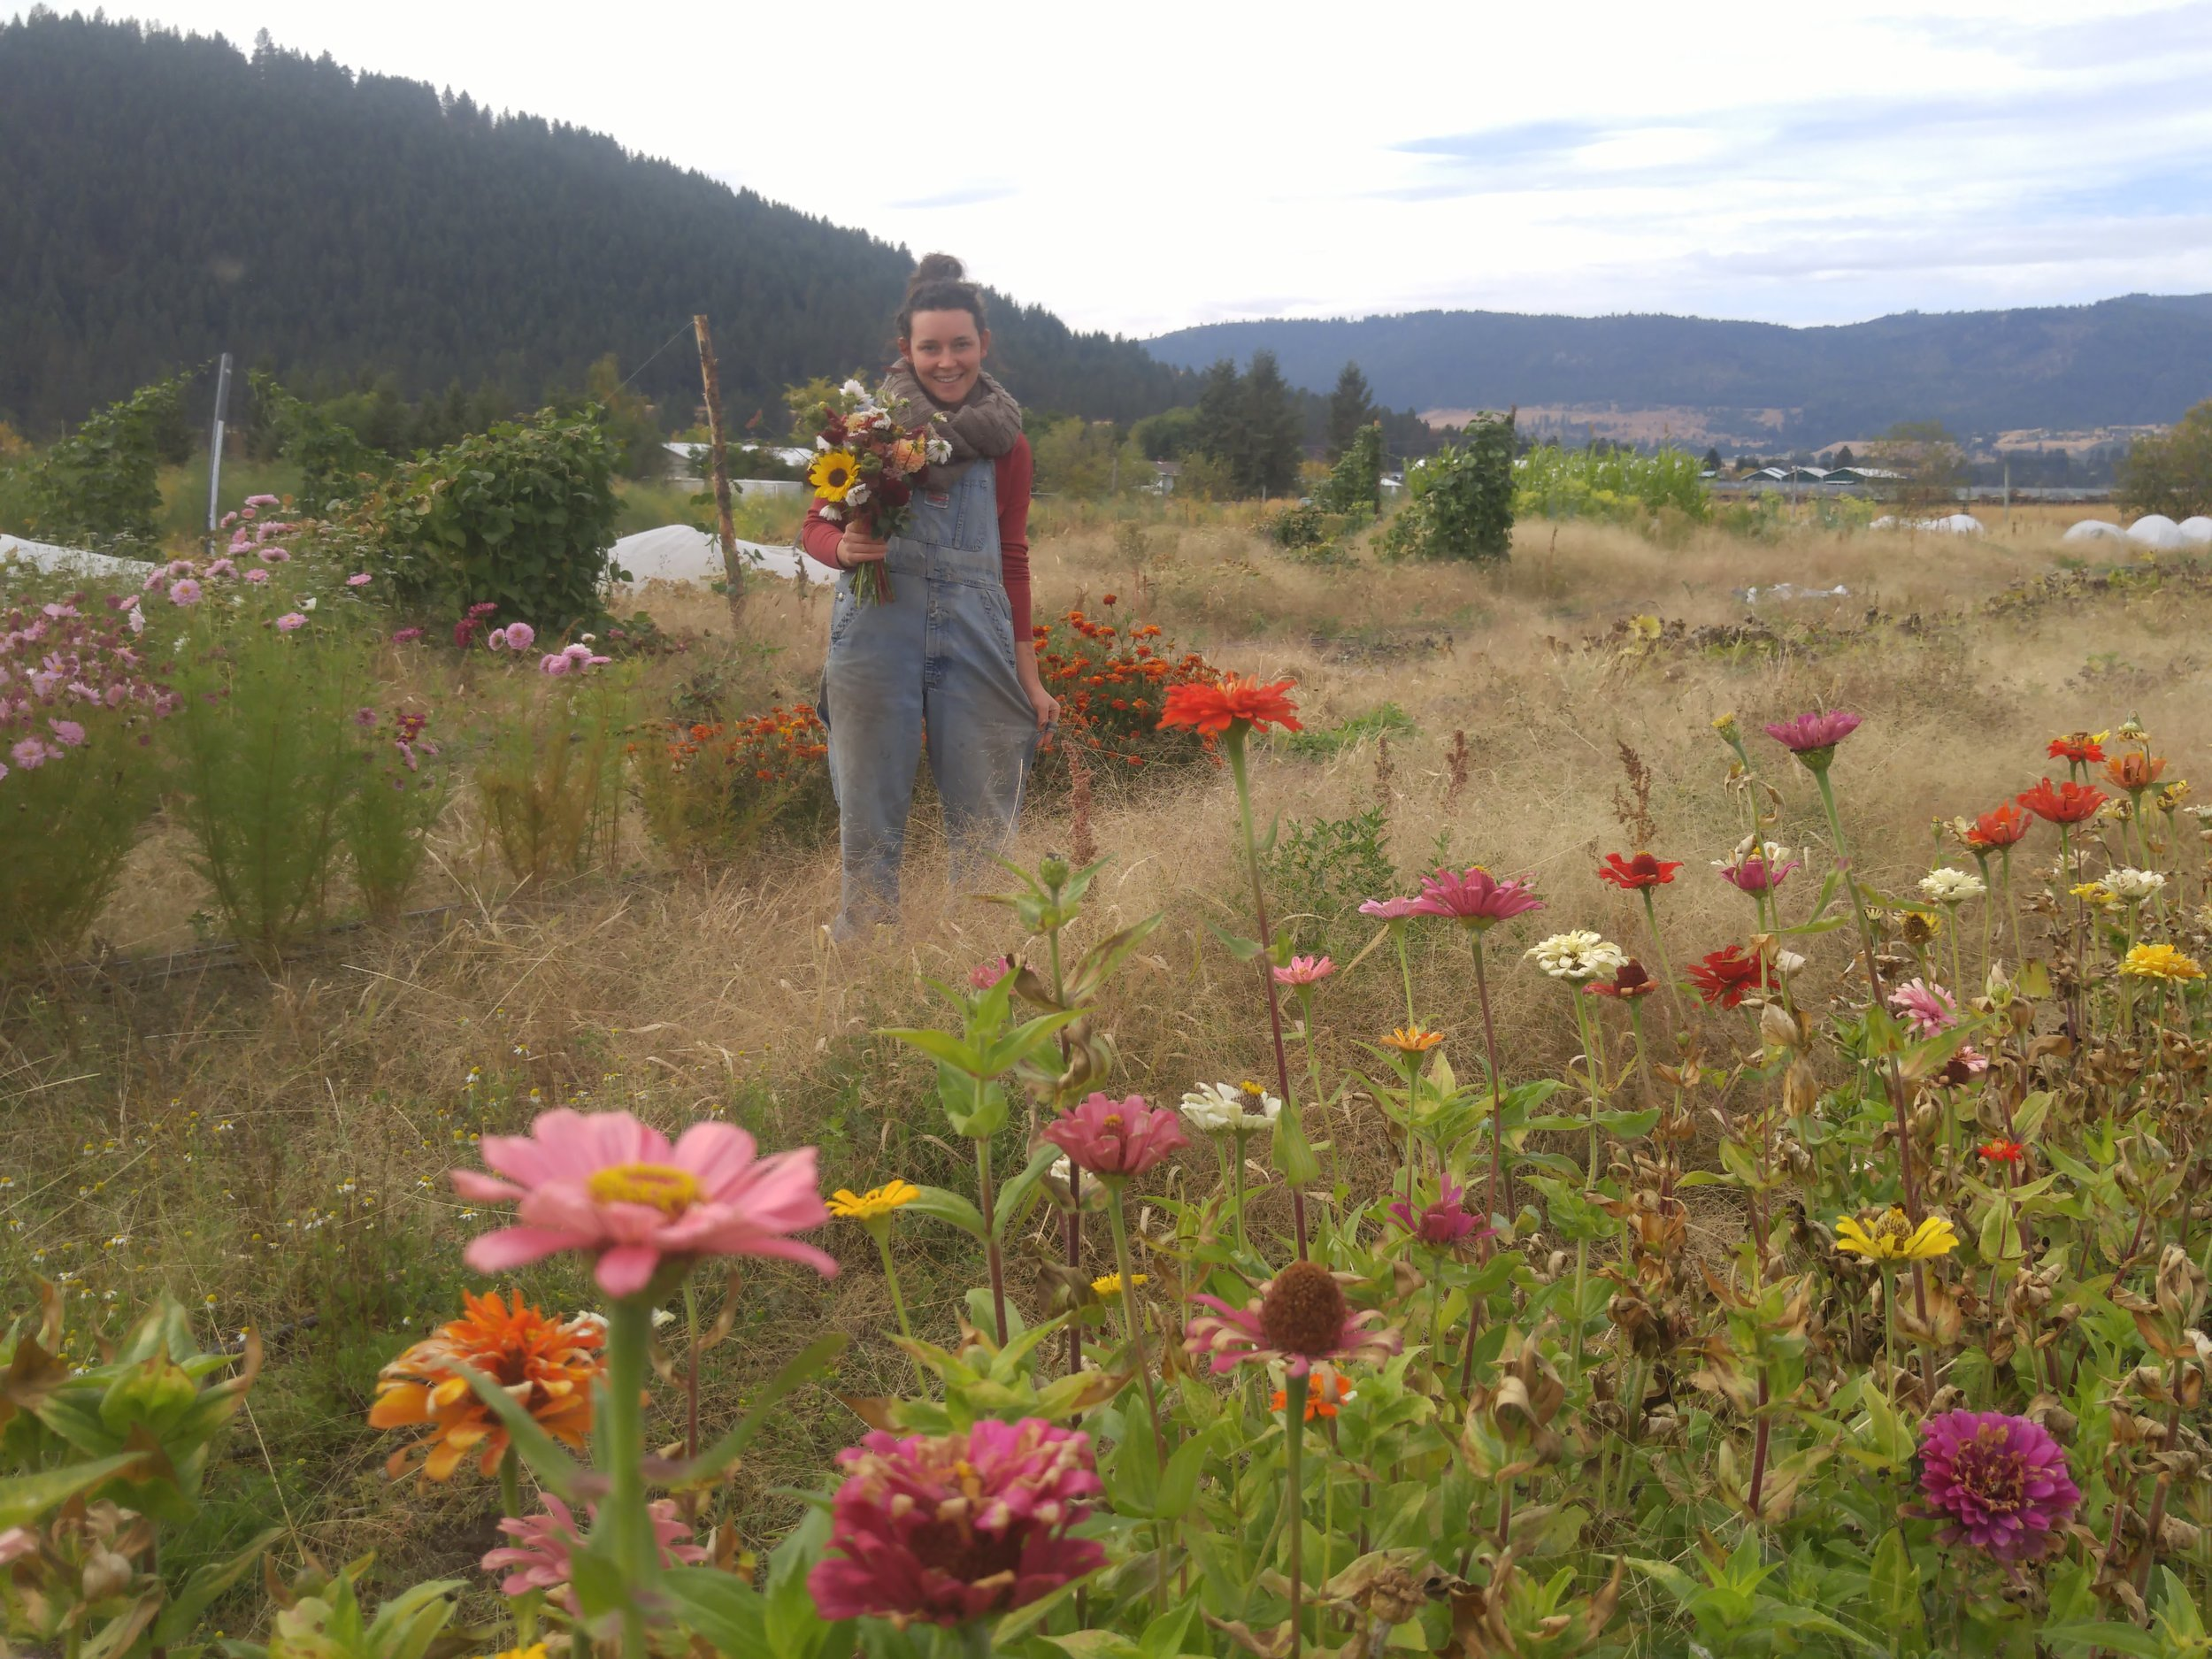 Hailey with Flowers.jpg